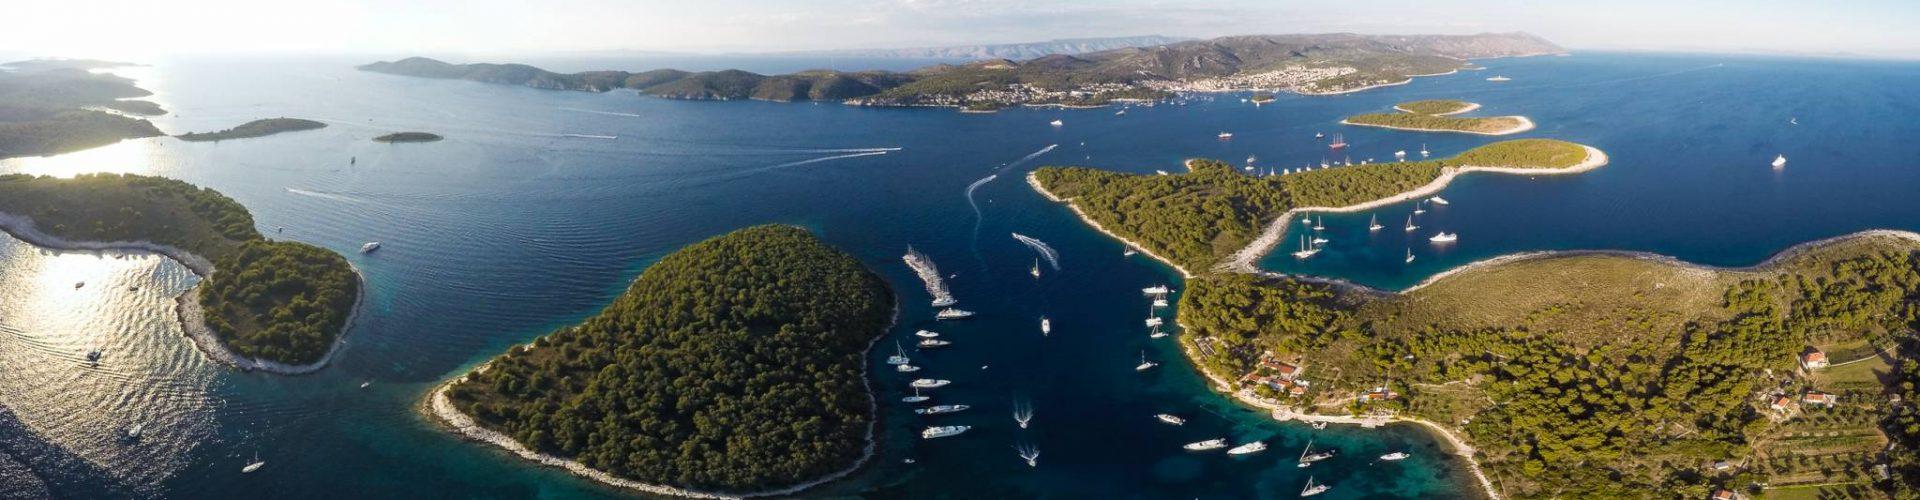 Island Trips with Dalmatia-holidays team